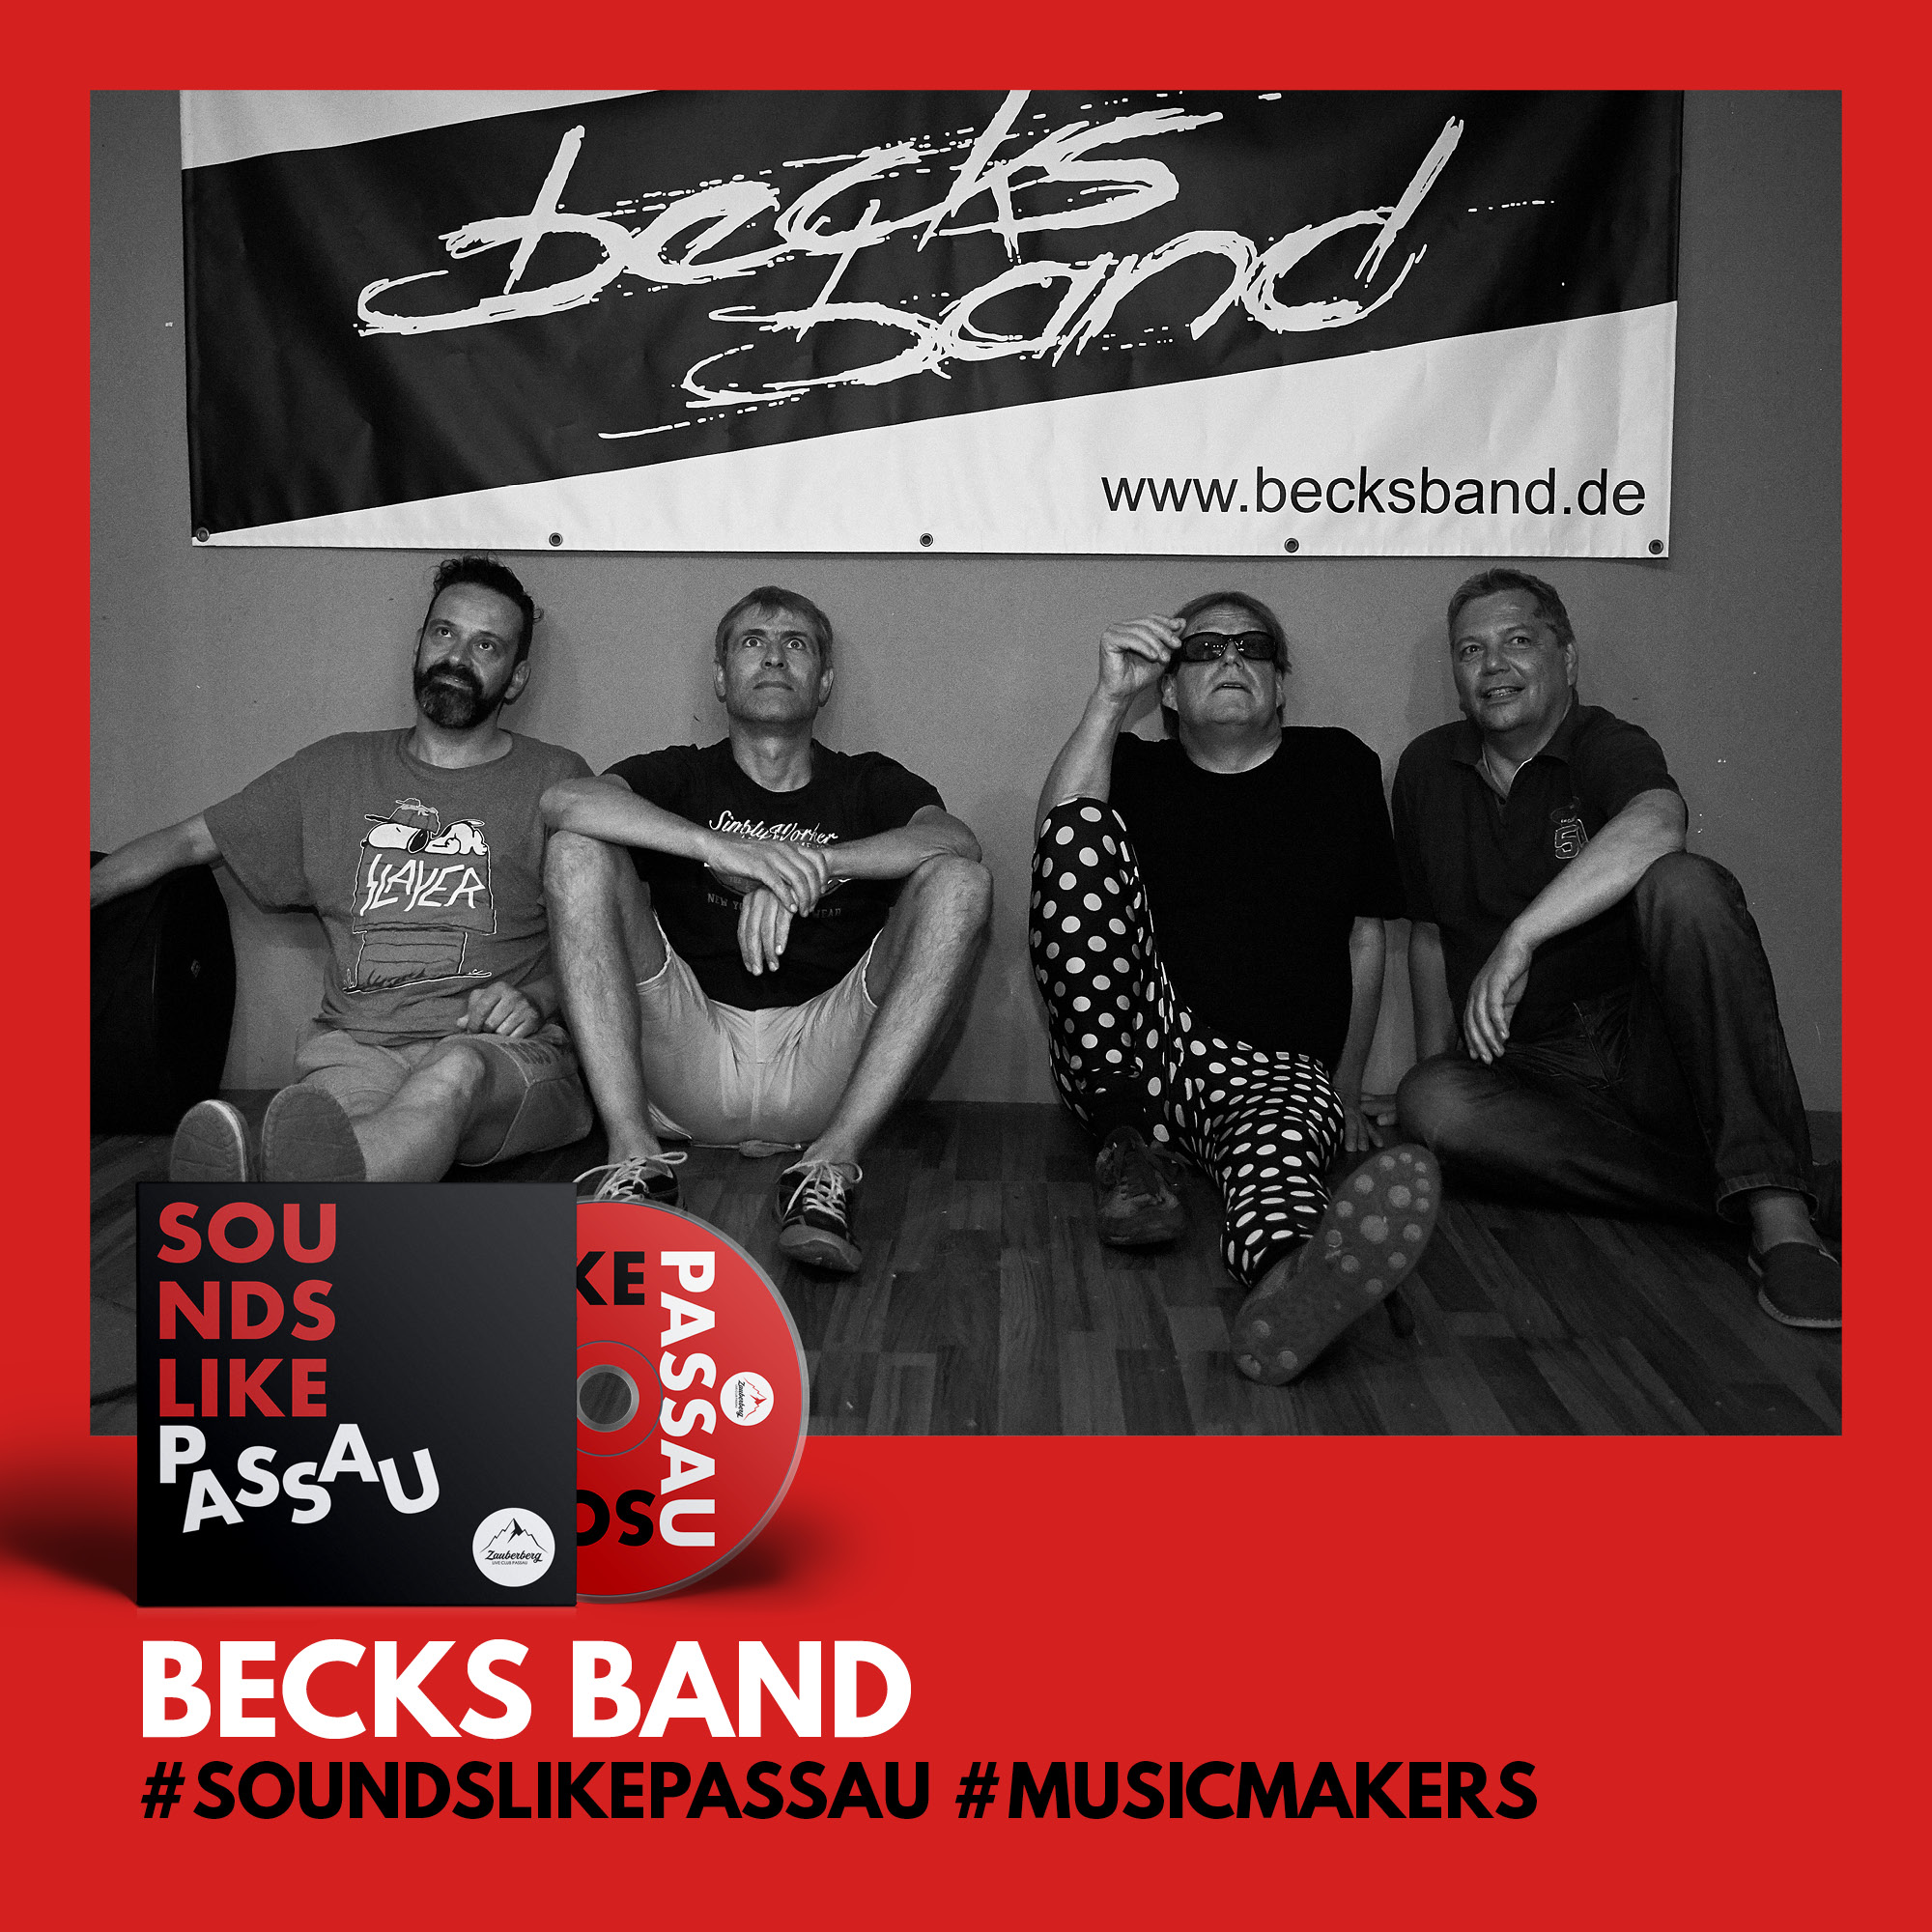 Becks Band